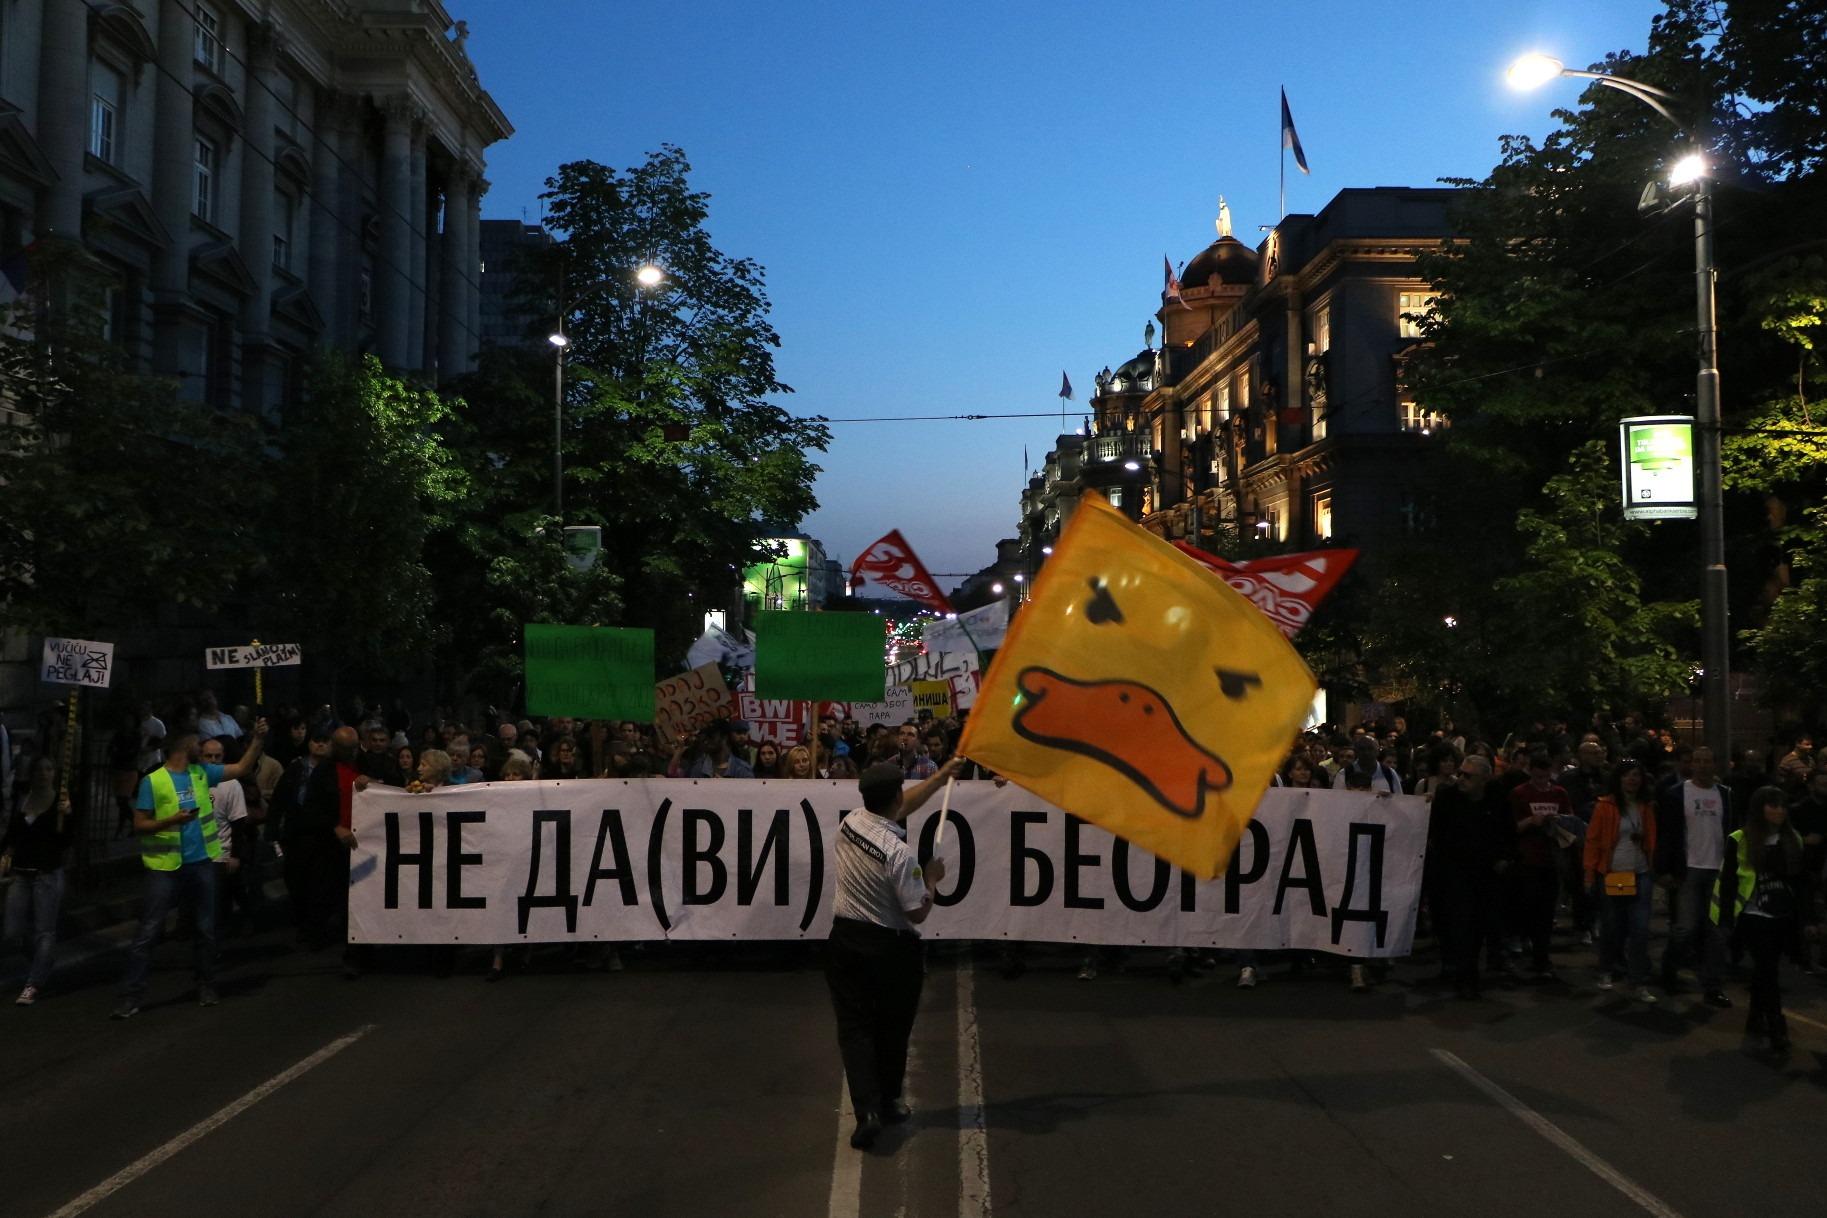 Foto: Ana Vuković